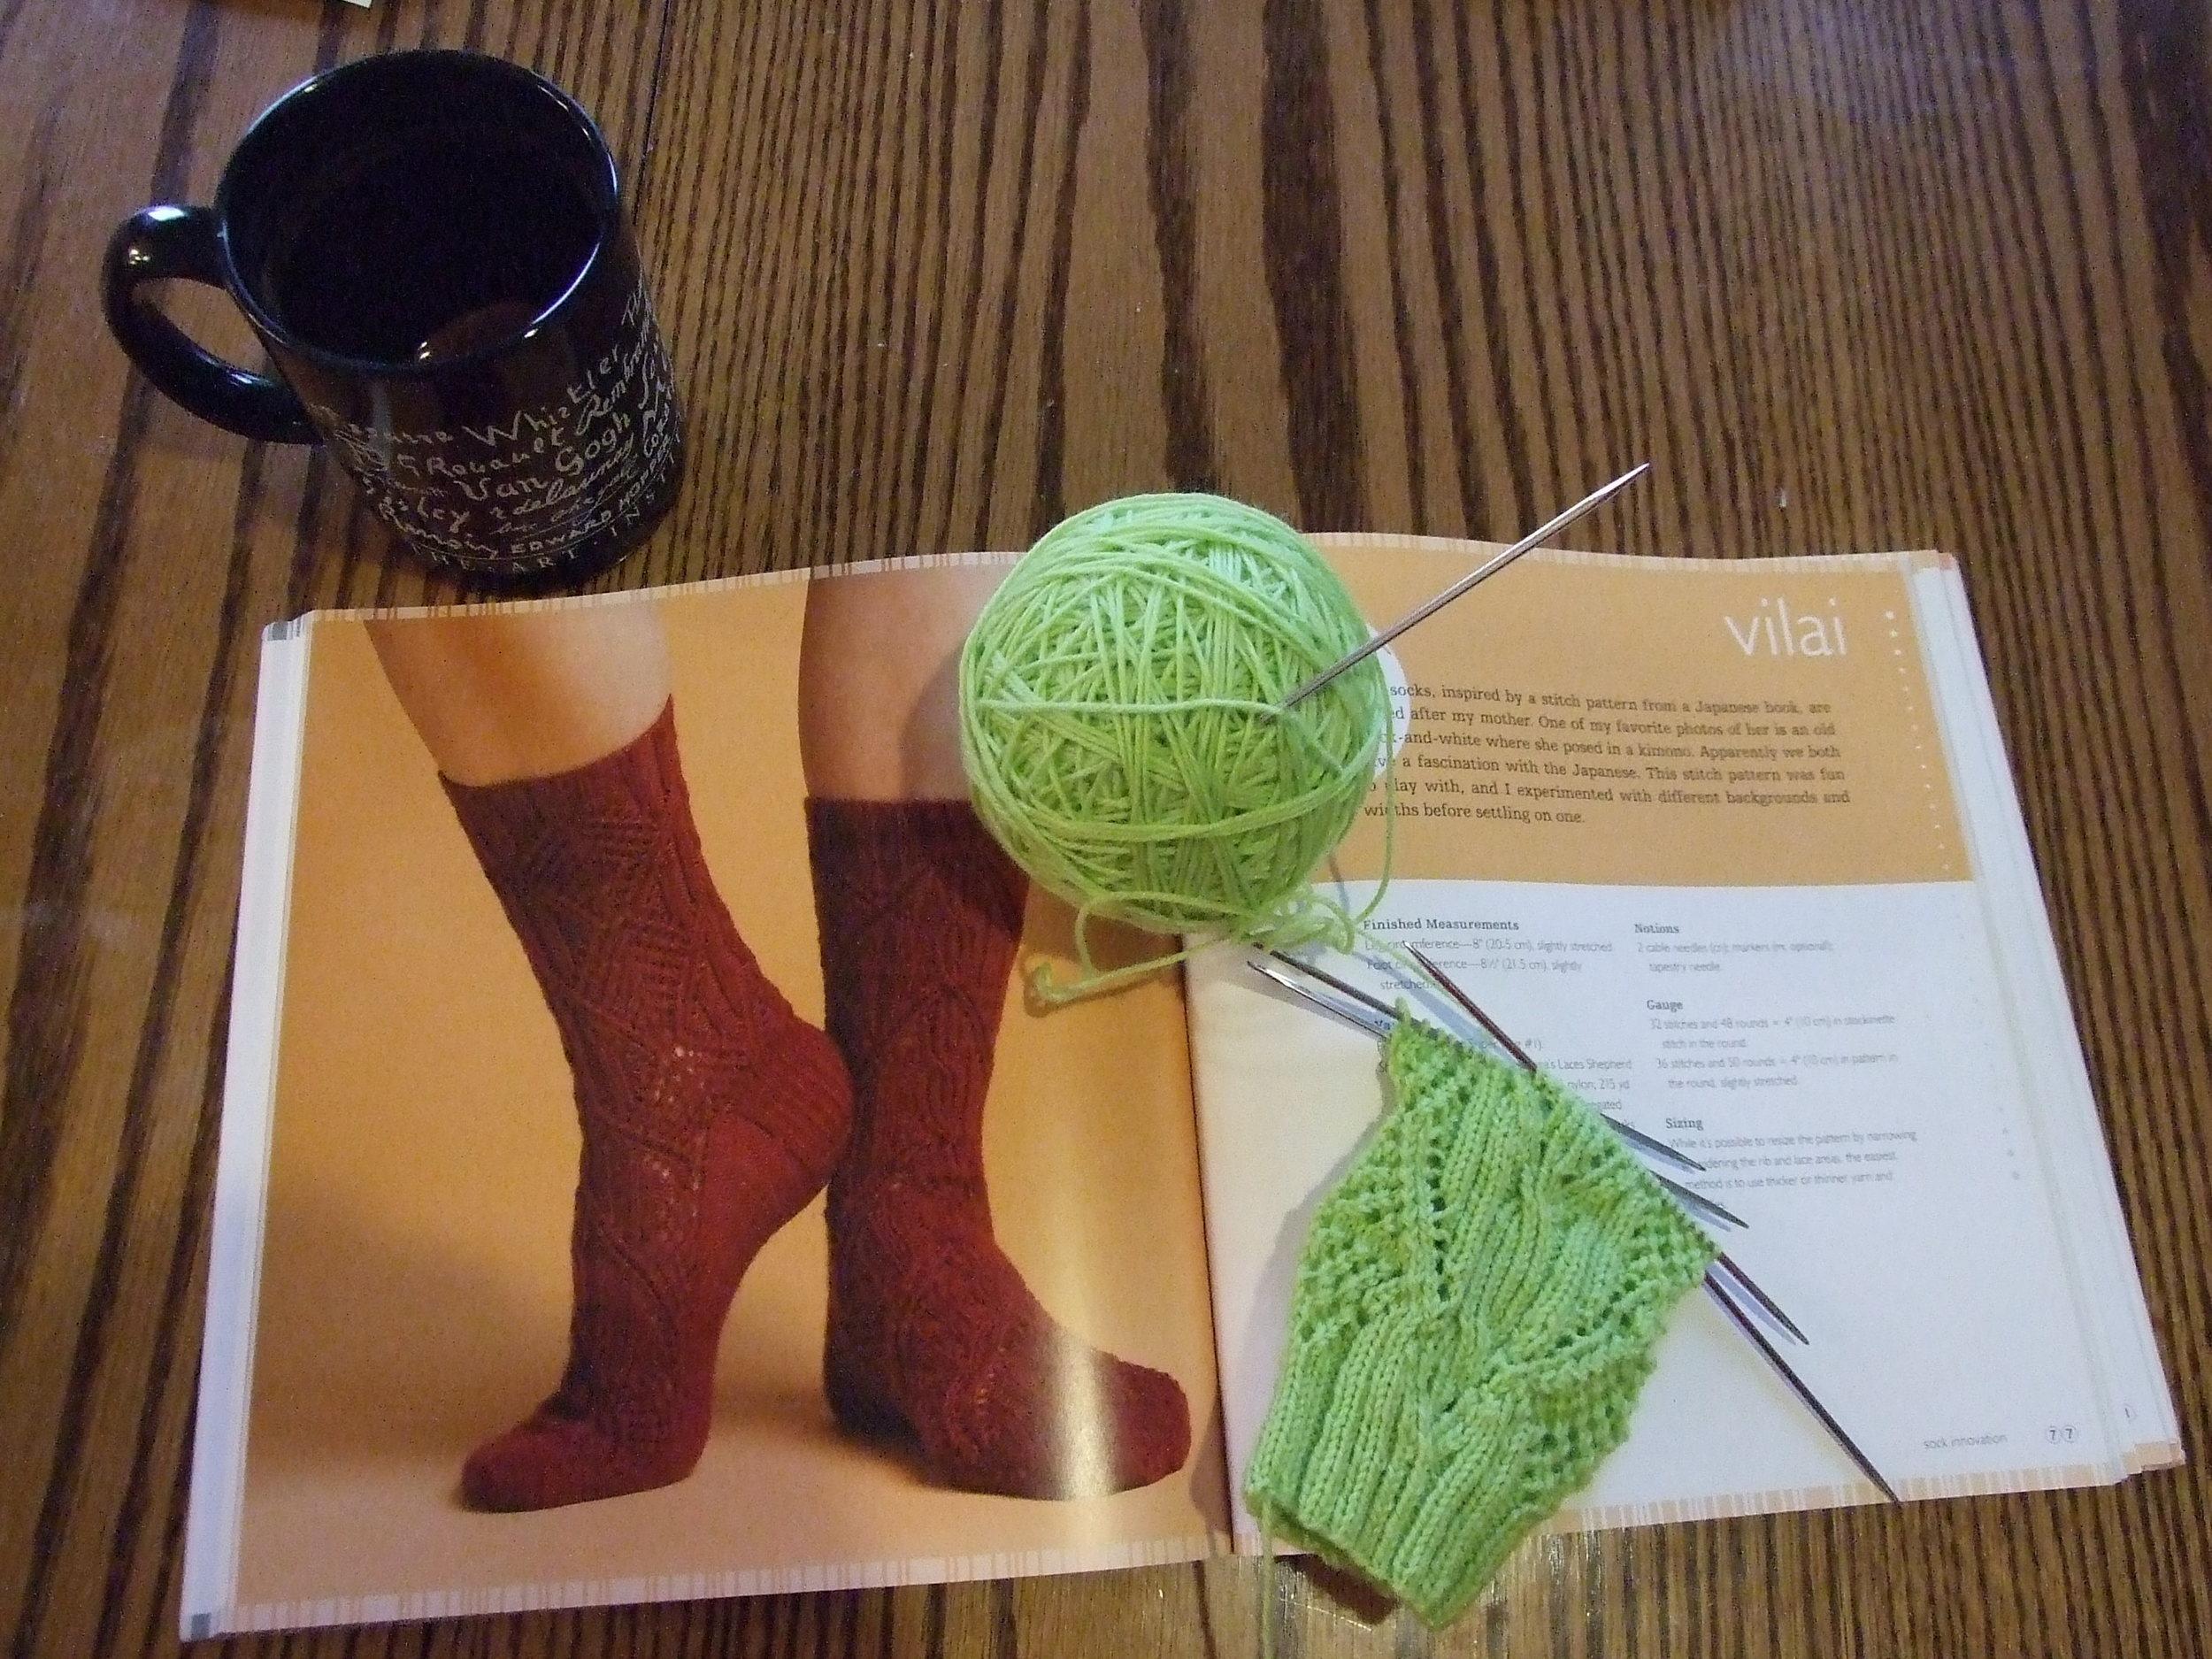 Pattern: Vilai from Cooki a's Sock Inovation Yarn: Cascade Yarns Heritage Sock Yarn Color: 5629